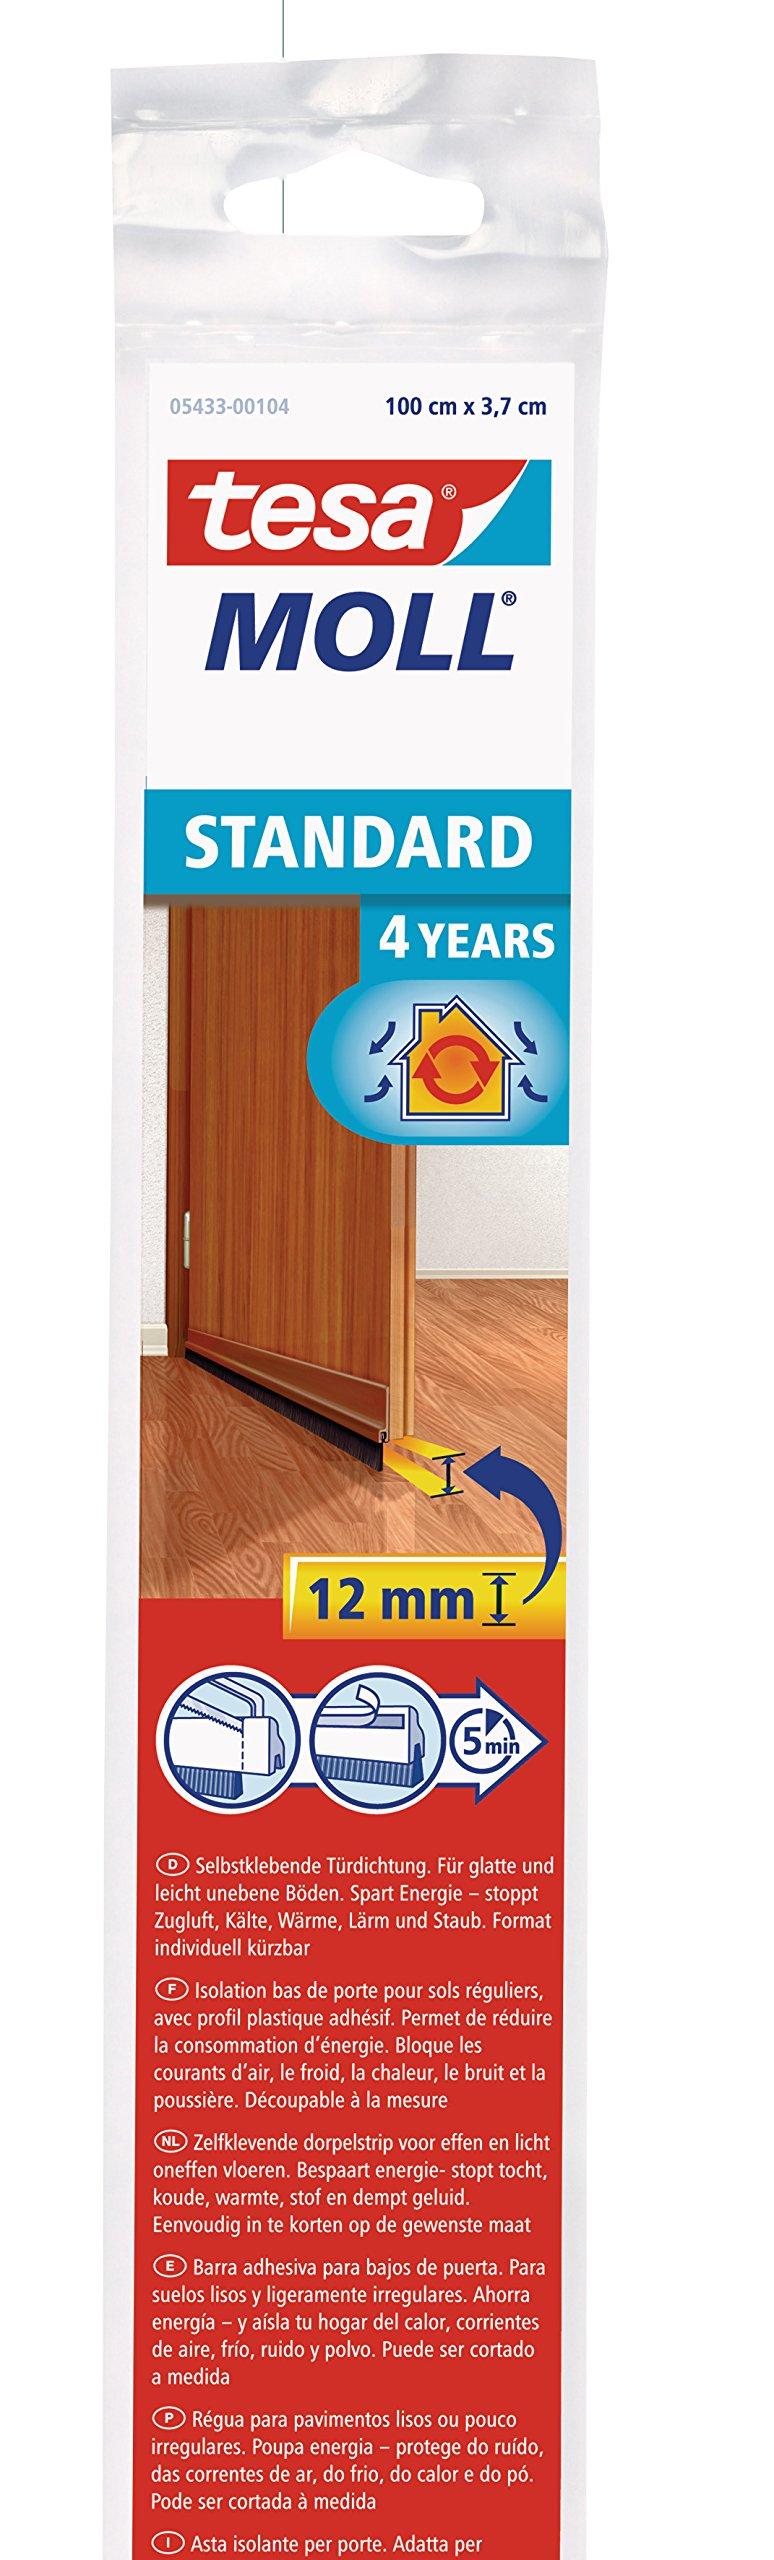 tesa UK Draught Excluder Door Brush for Standard Surfaces - Brown